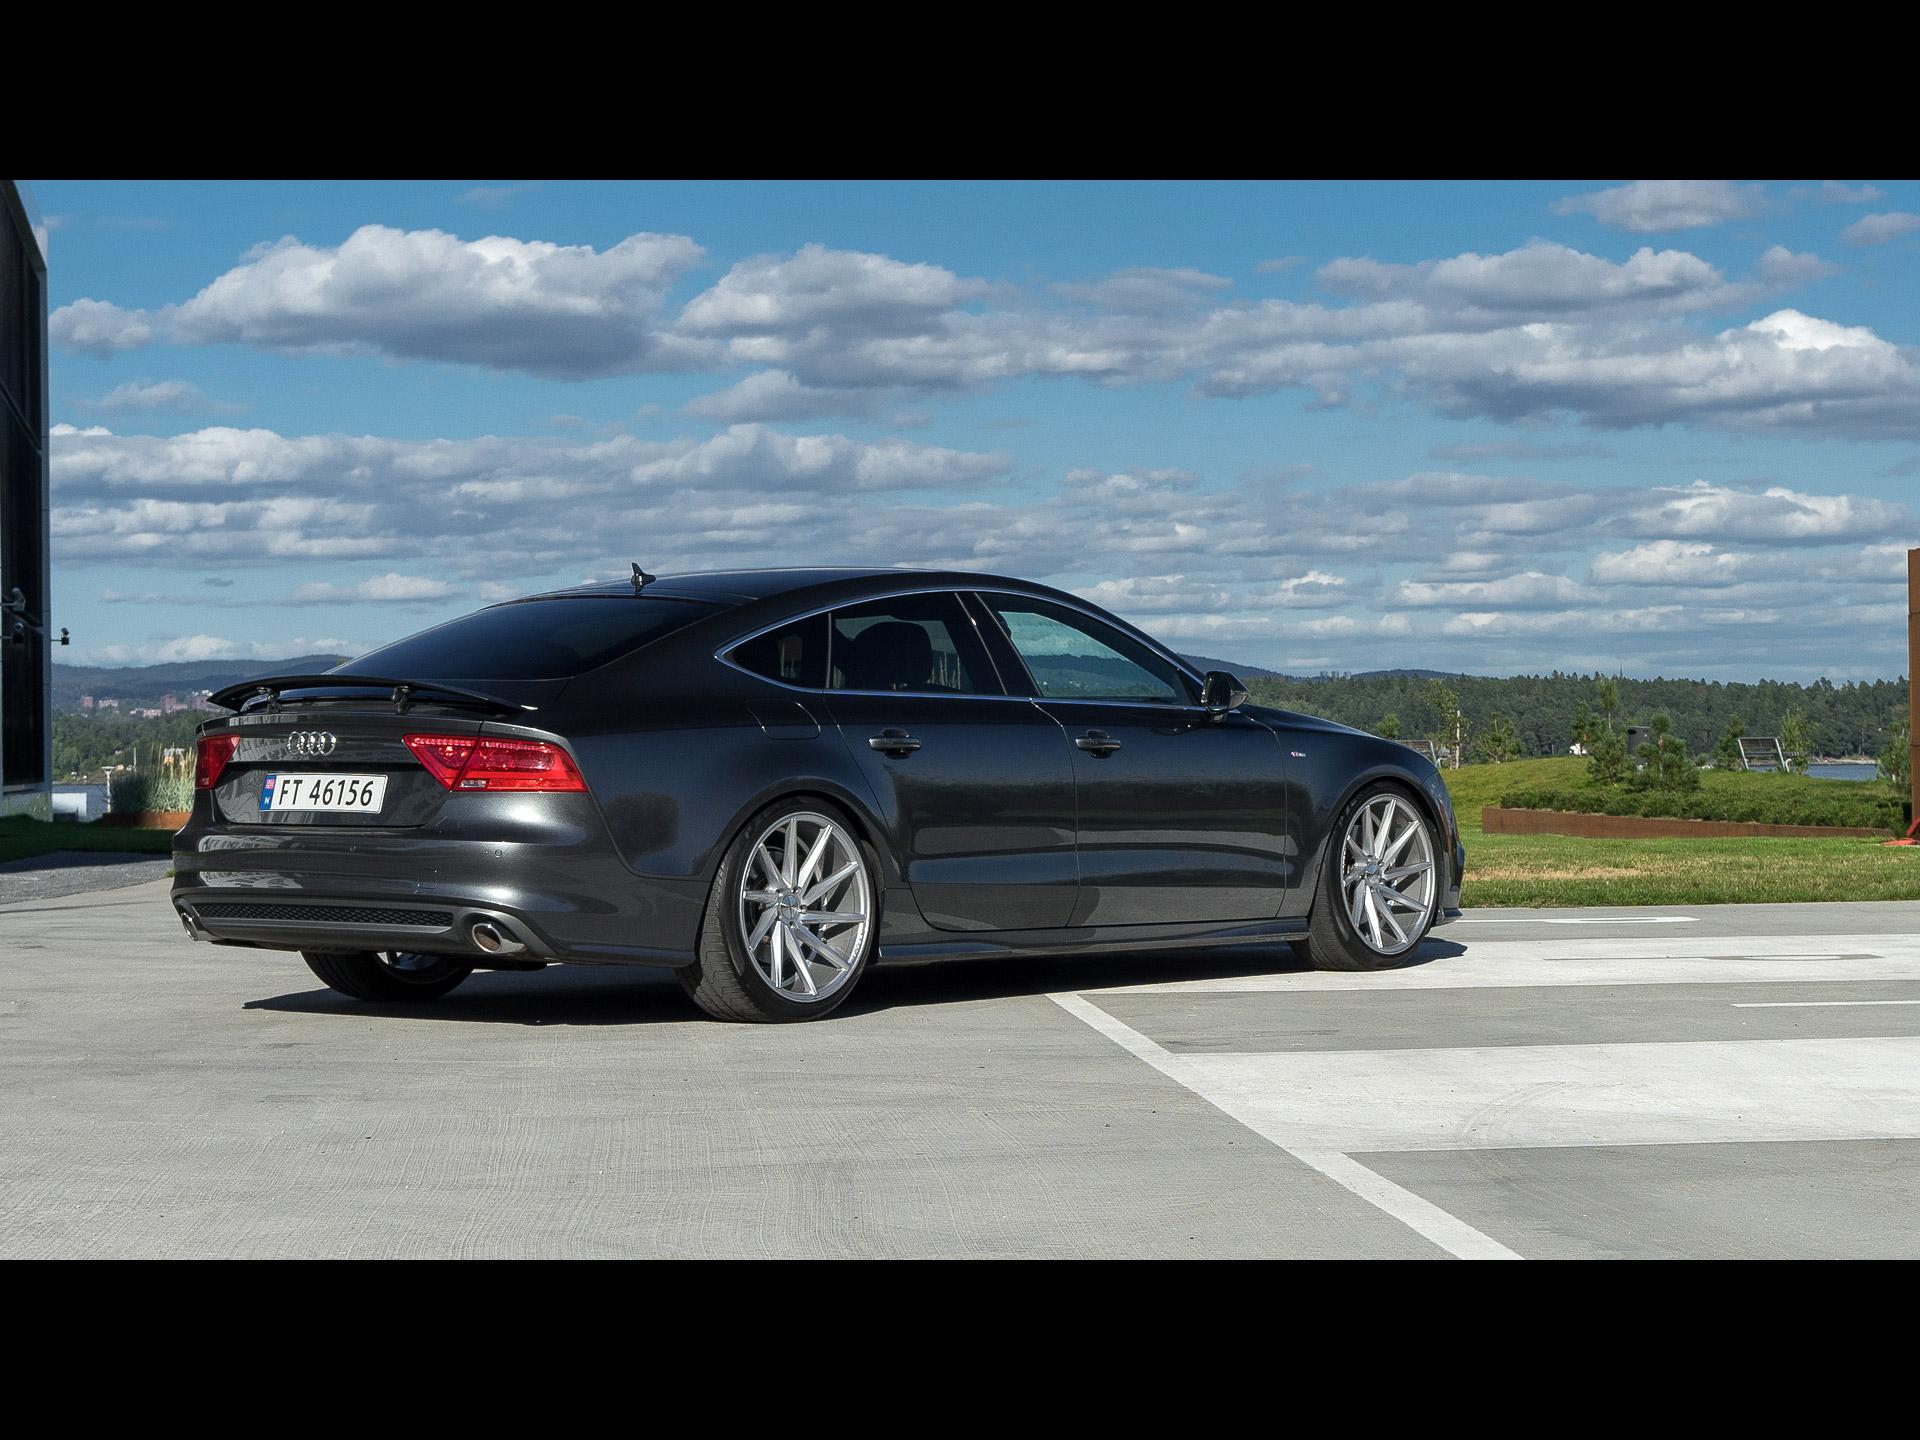 VOSSEN Wheels Audi A7 Sportback S line 2014 - アウディに嵌まる ...